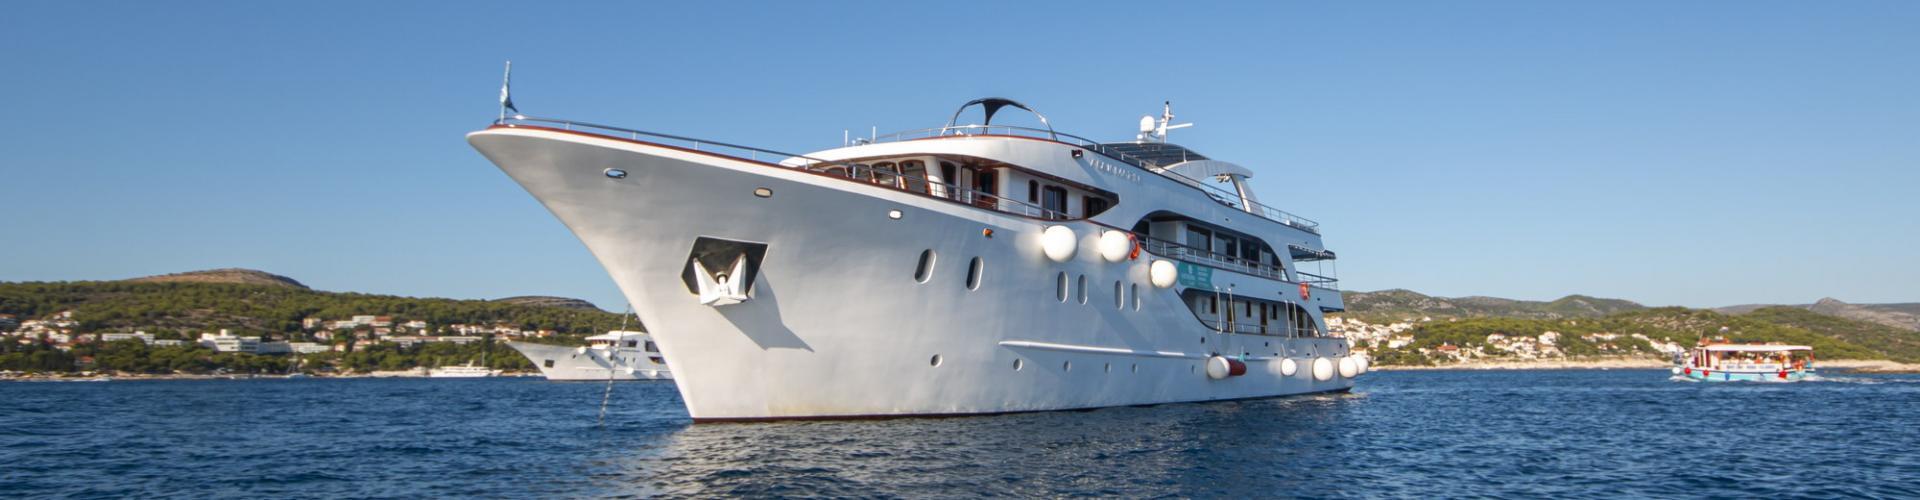 2017. Deluxe cruiser MV Aquamarin